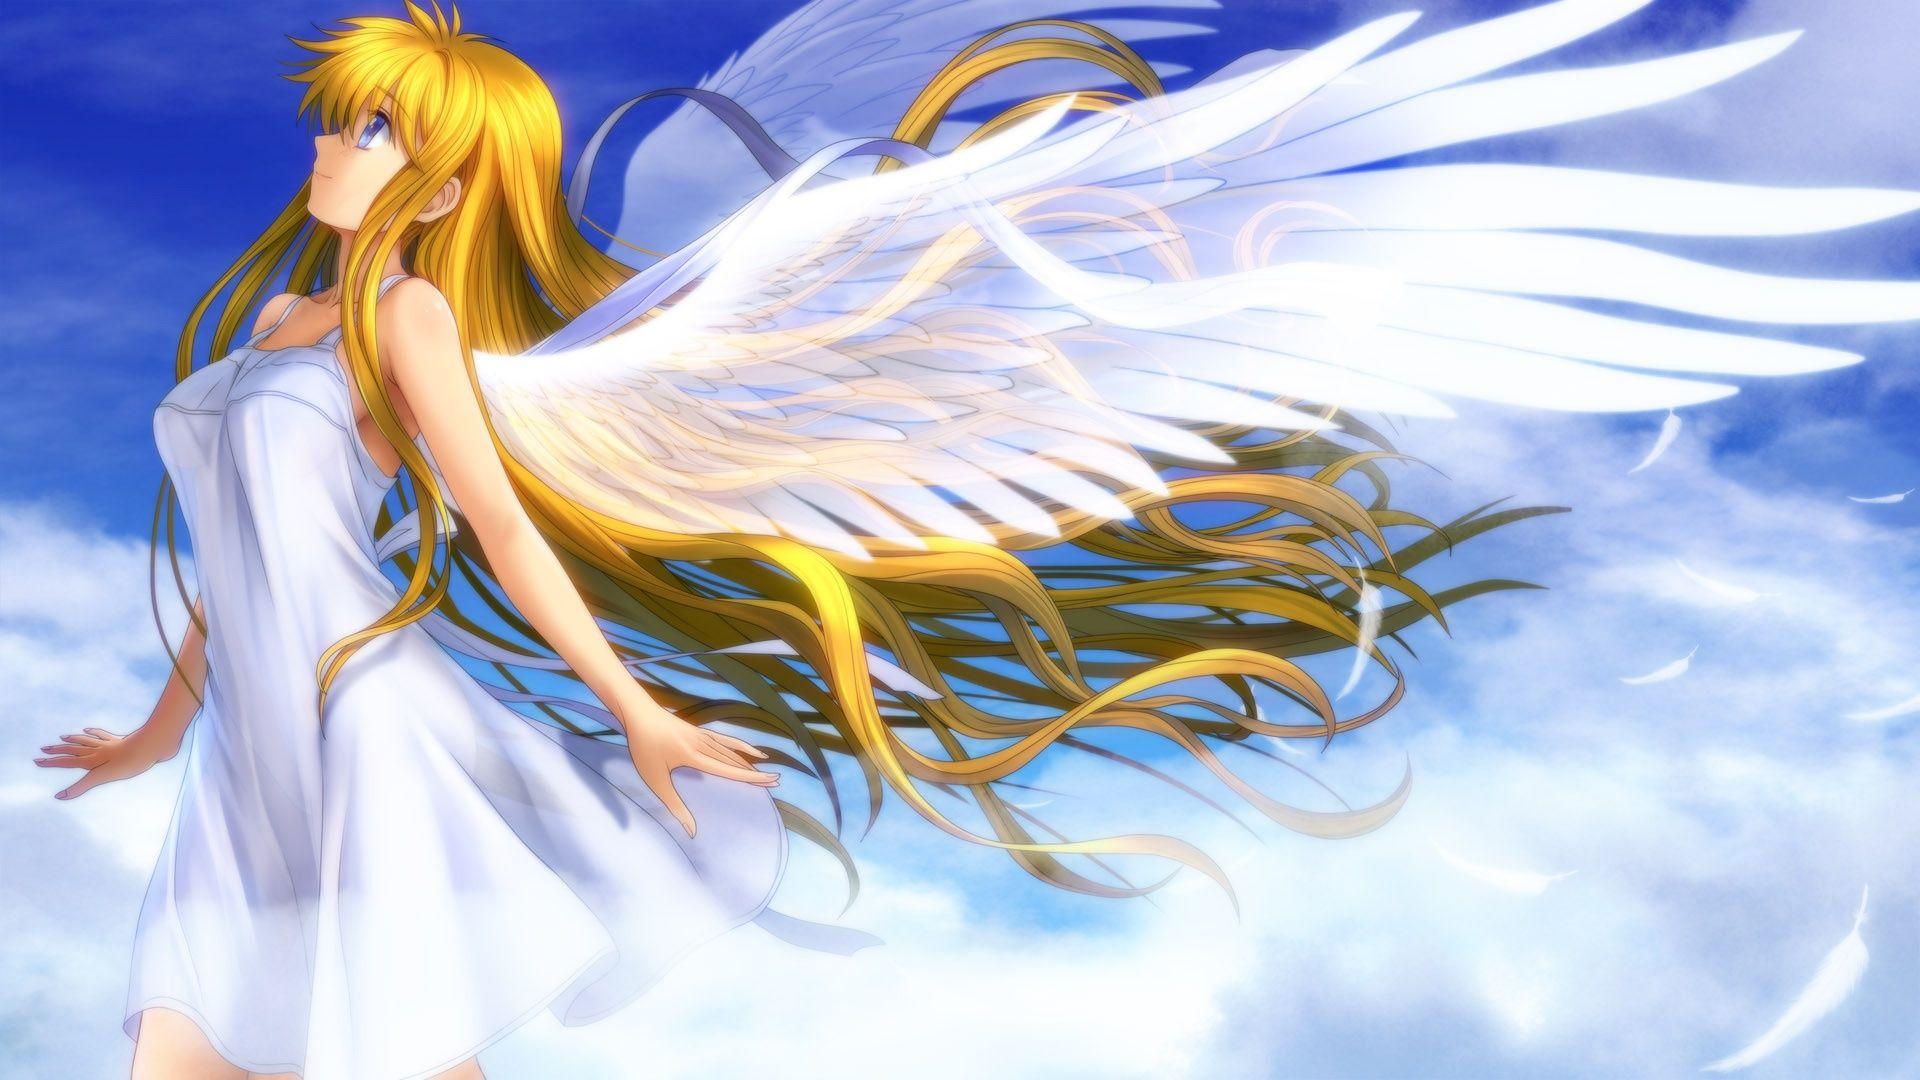 anime girls belts feathers - photo #15